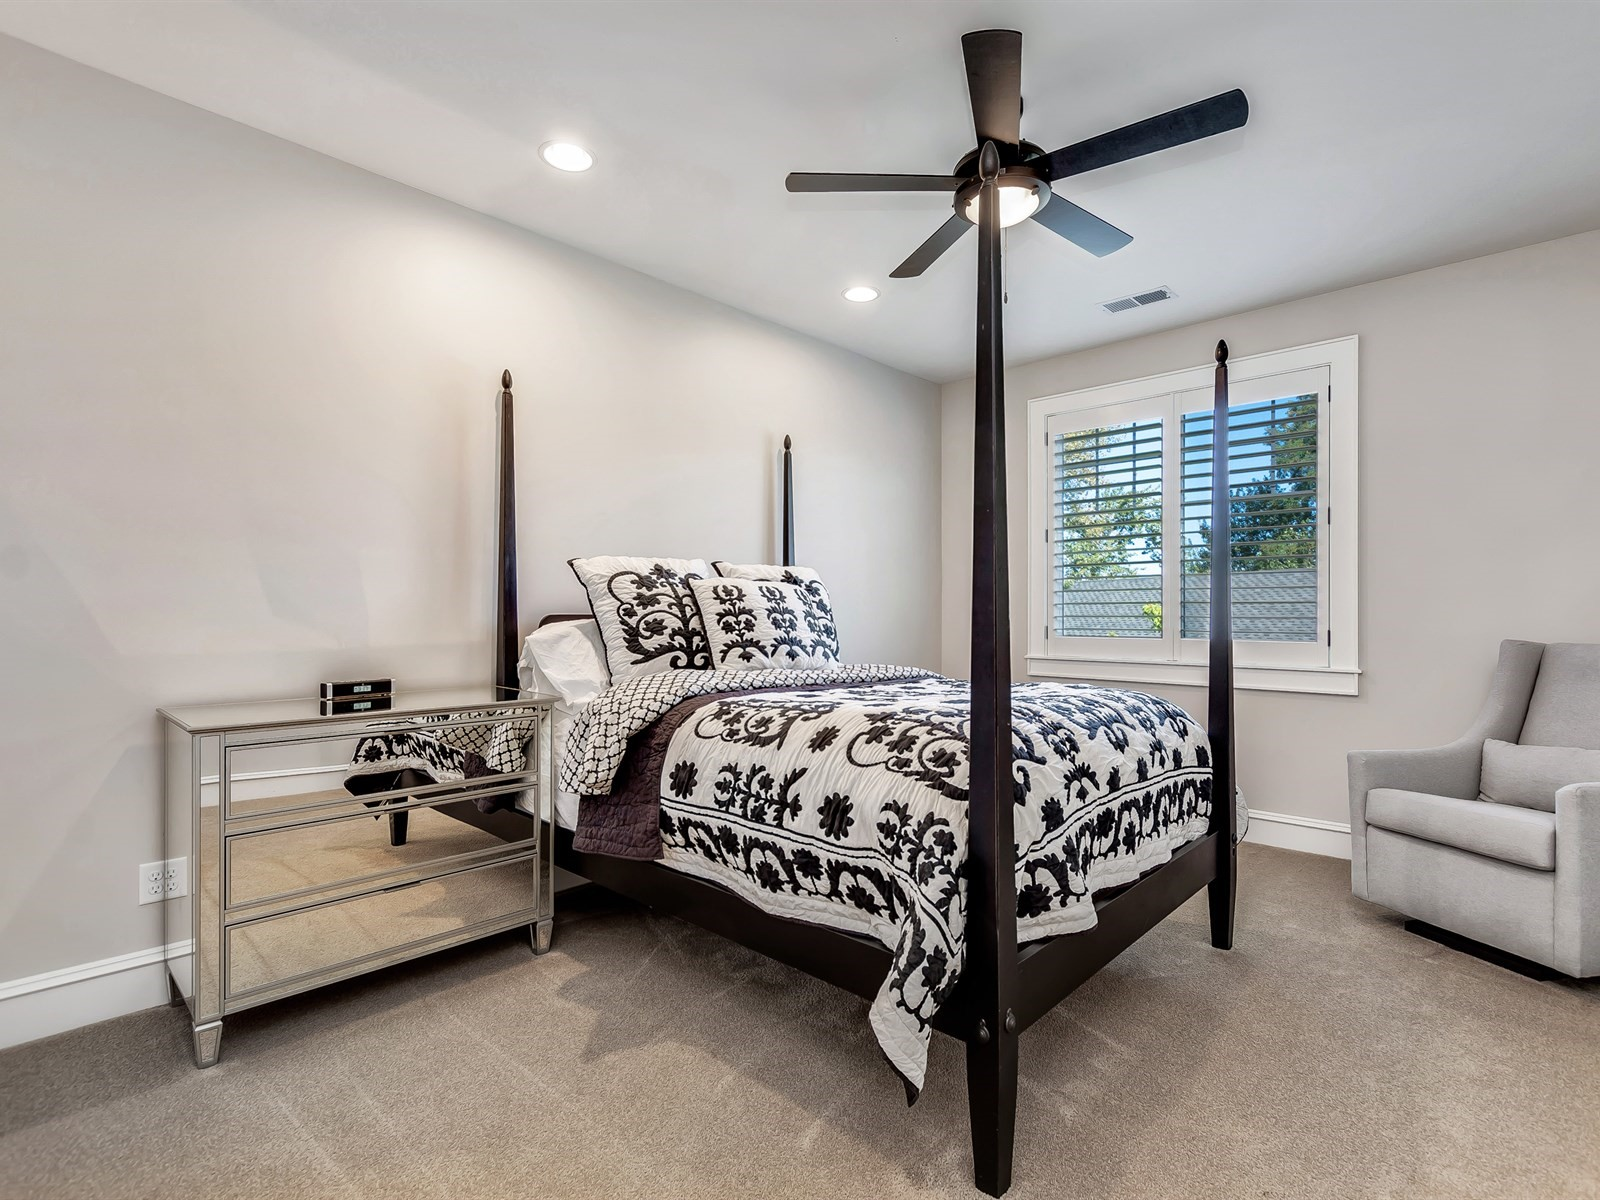 051_Bedroom .jpg